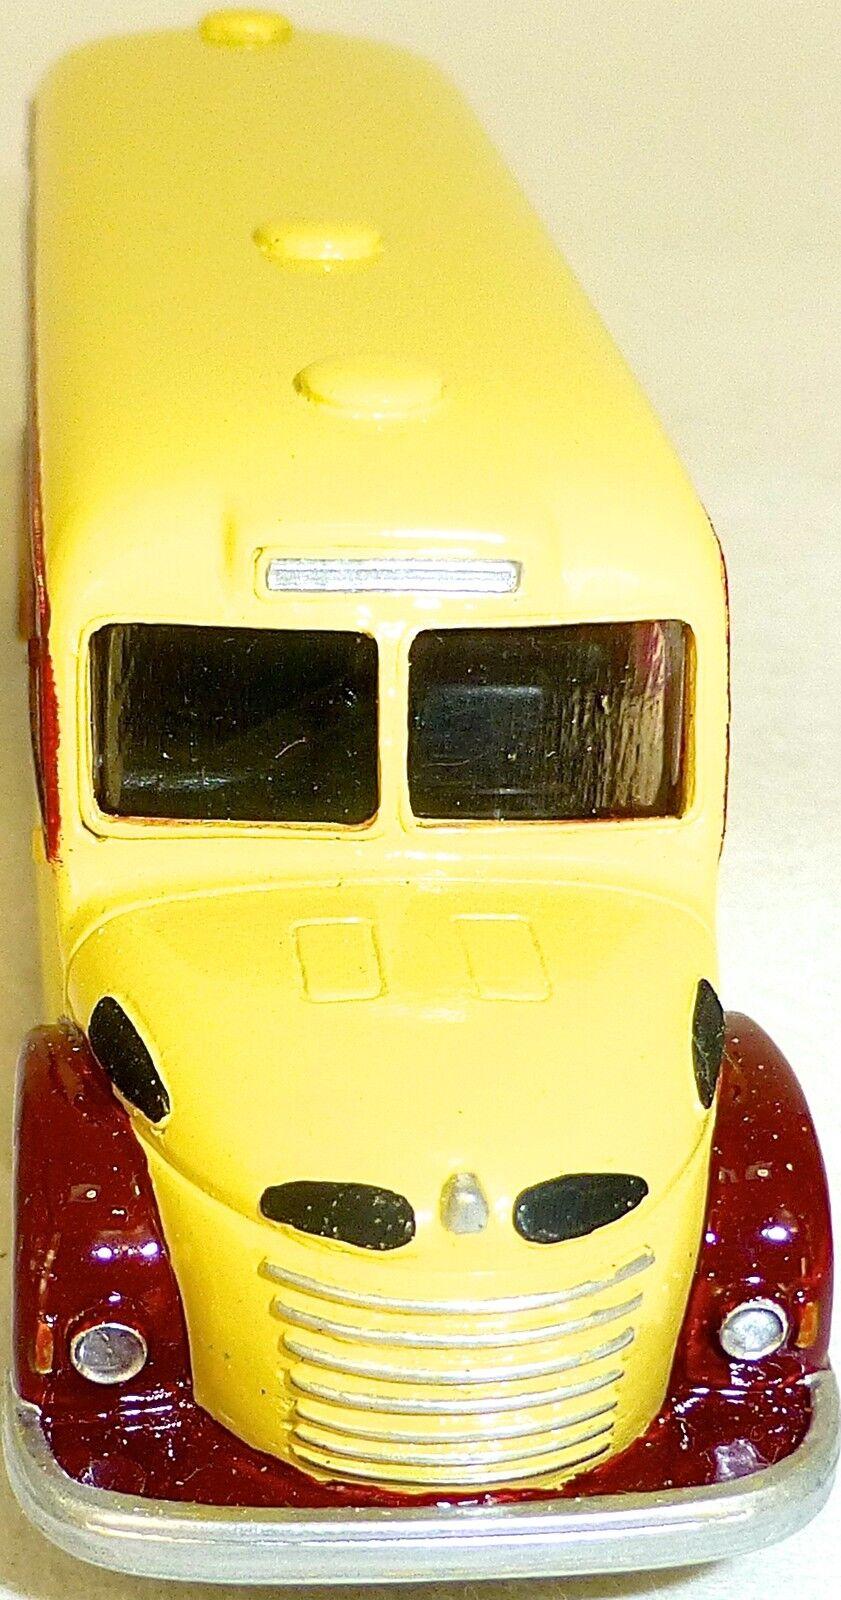 1953 Gräf y Lazo 120 Fon ÖBB red red red yellow Bus Omnibus H0 1 87 V&v 2341 GD4 Å 565ed1